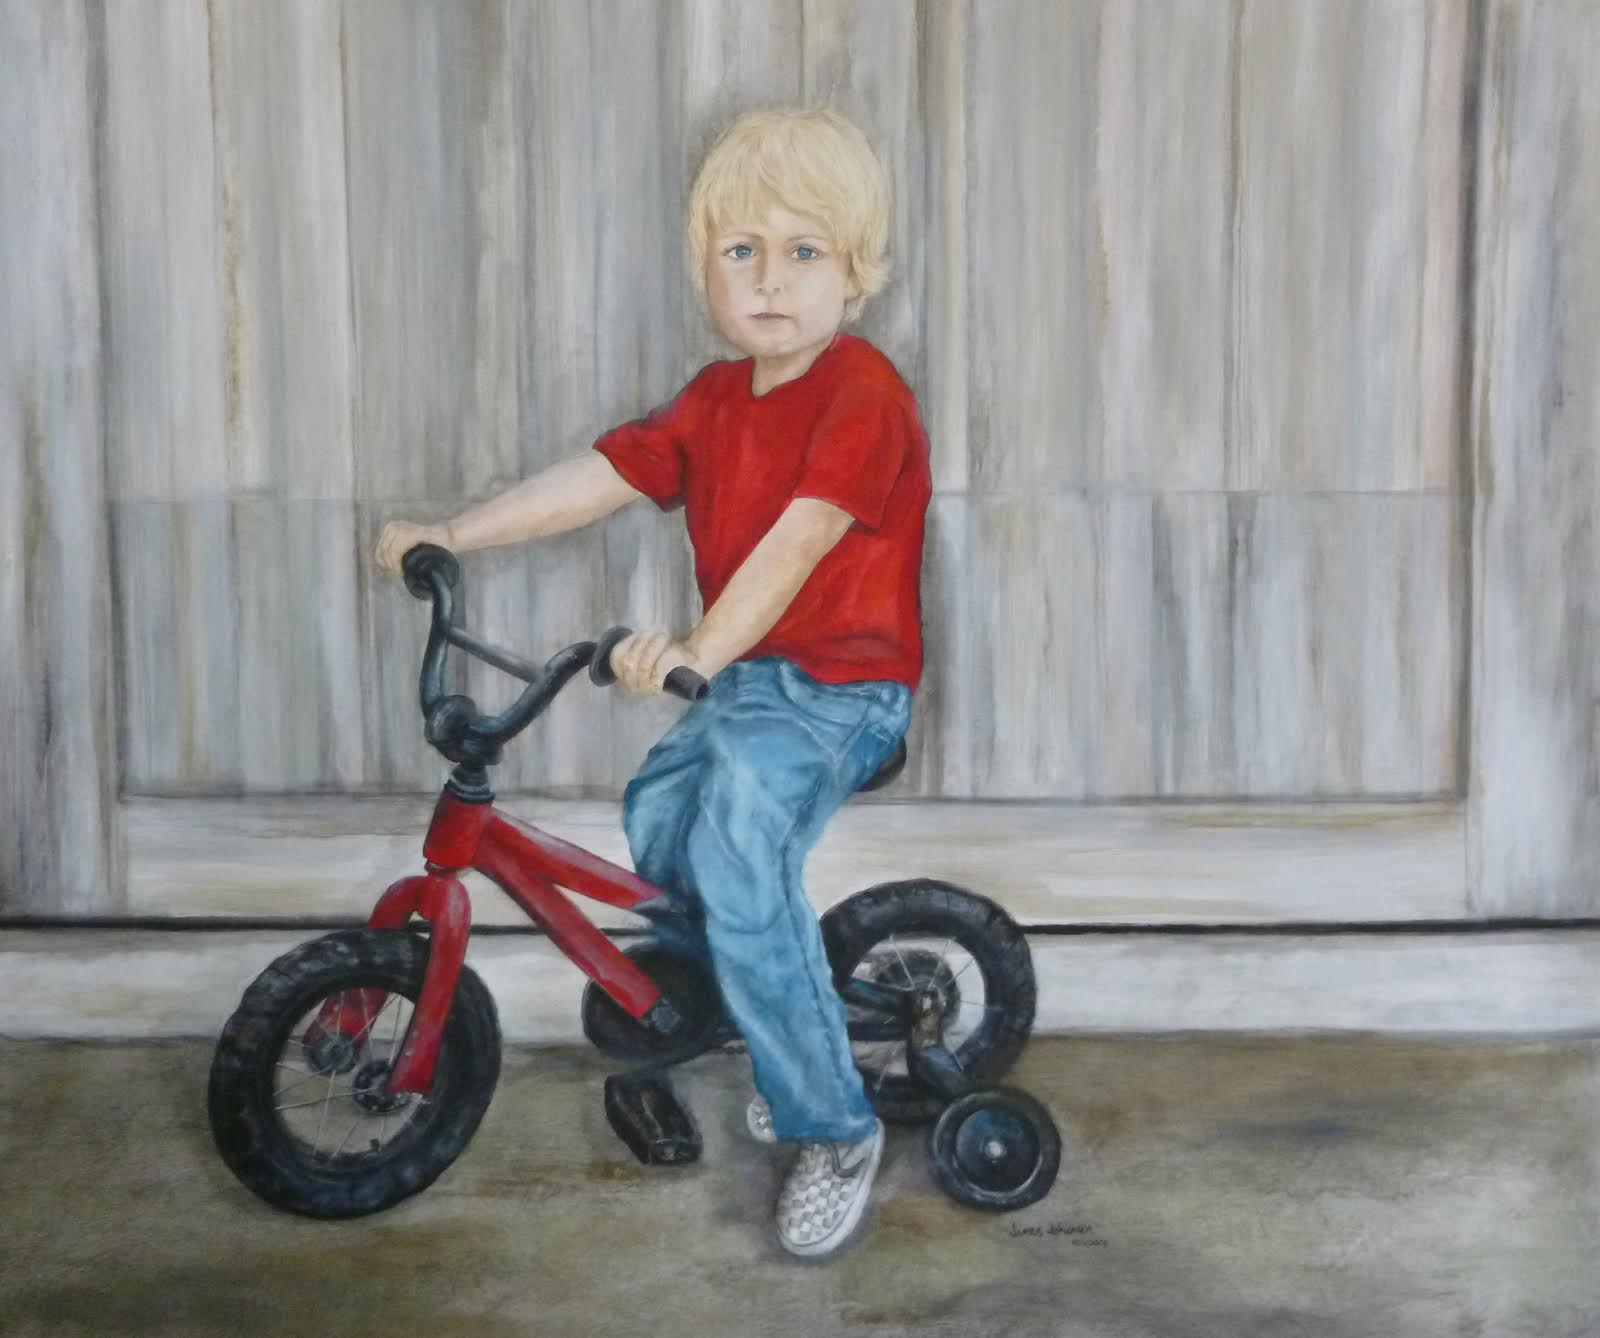 austin and his bike